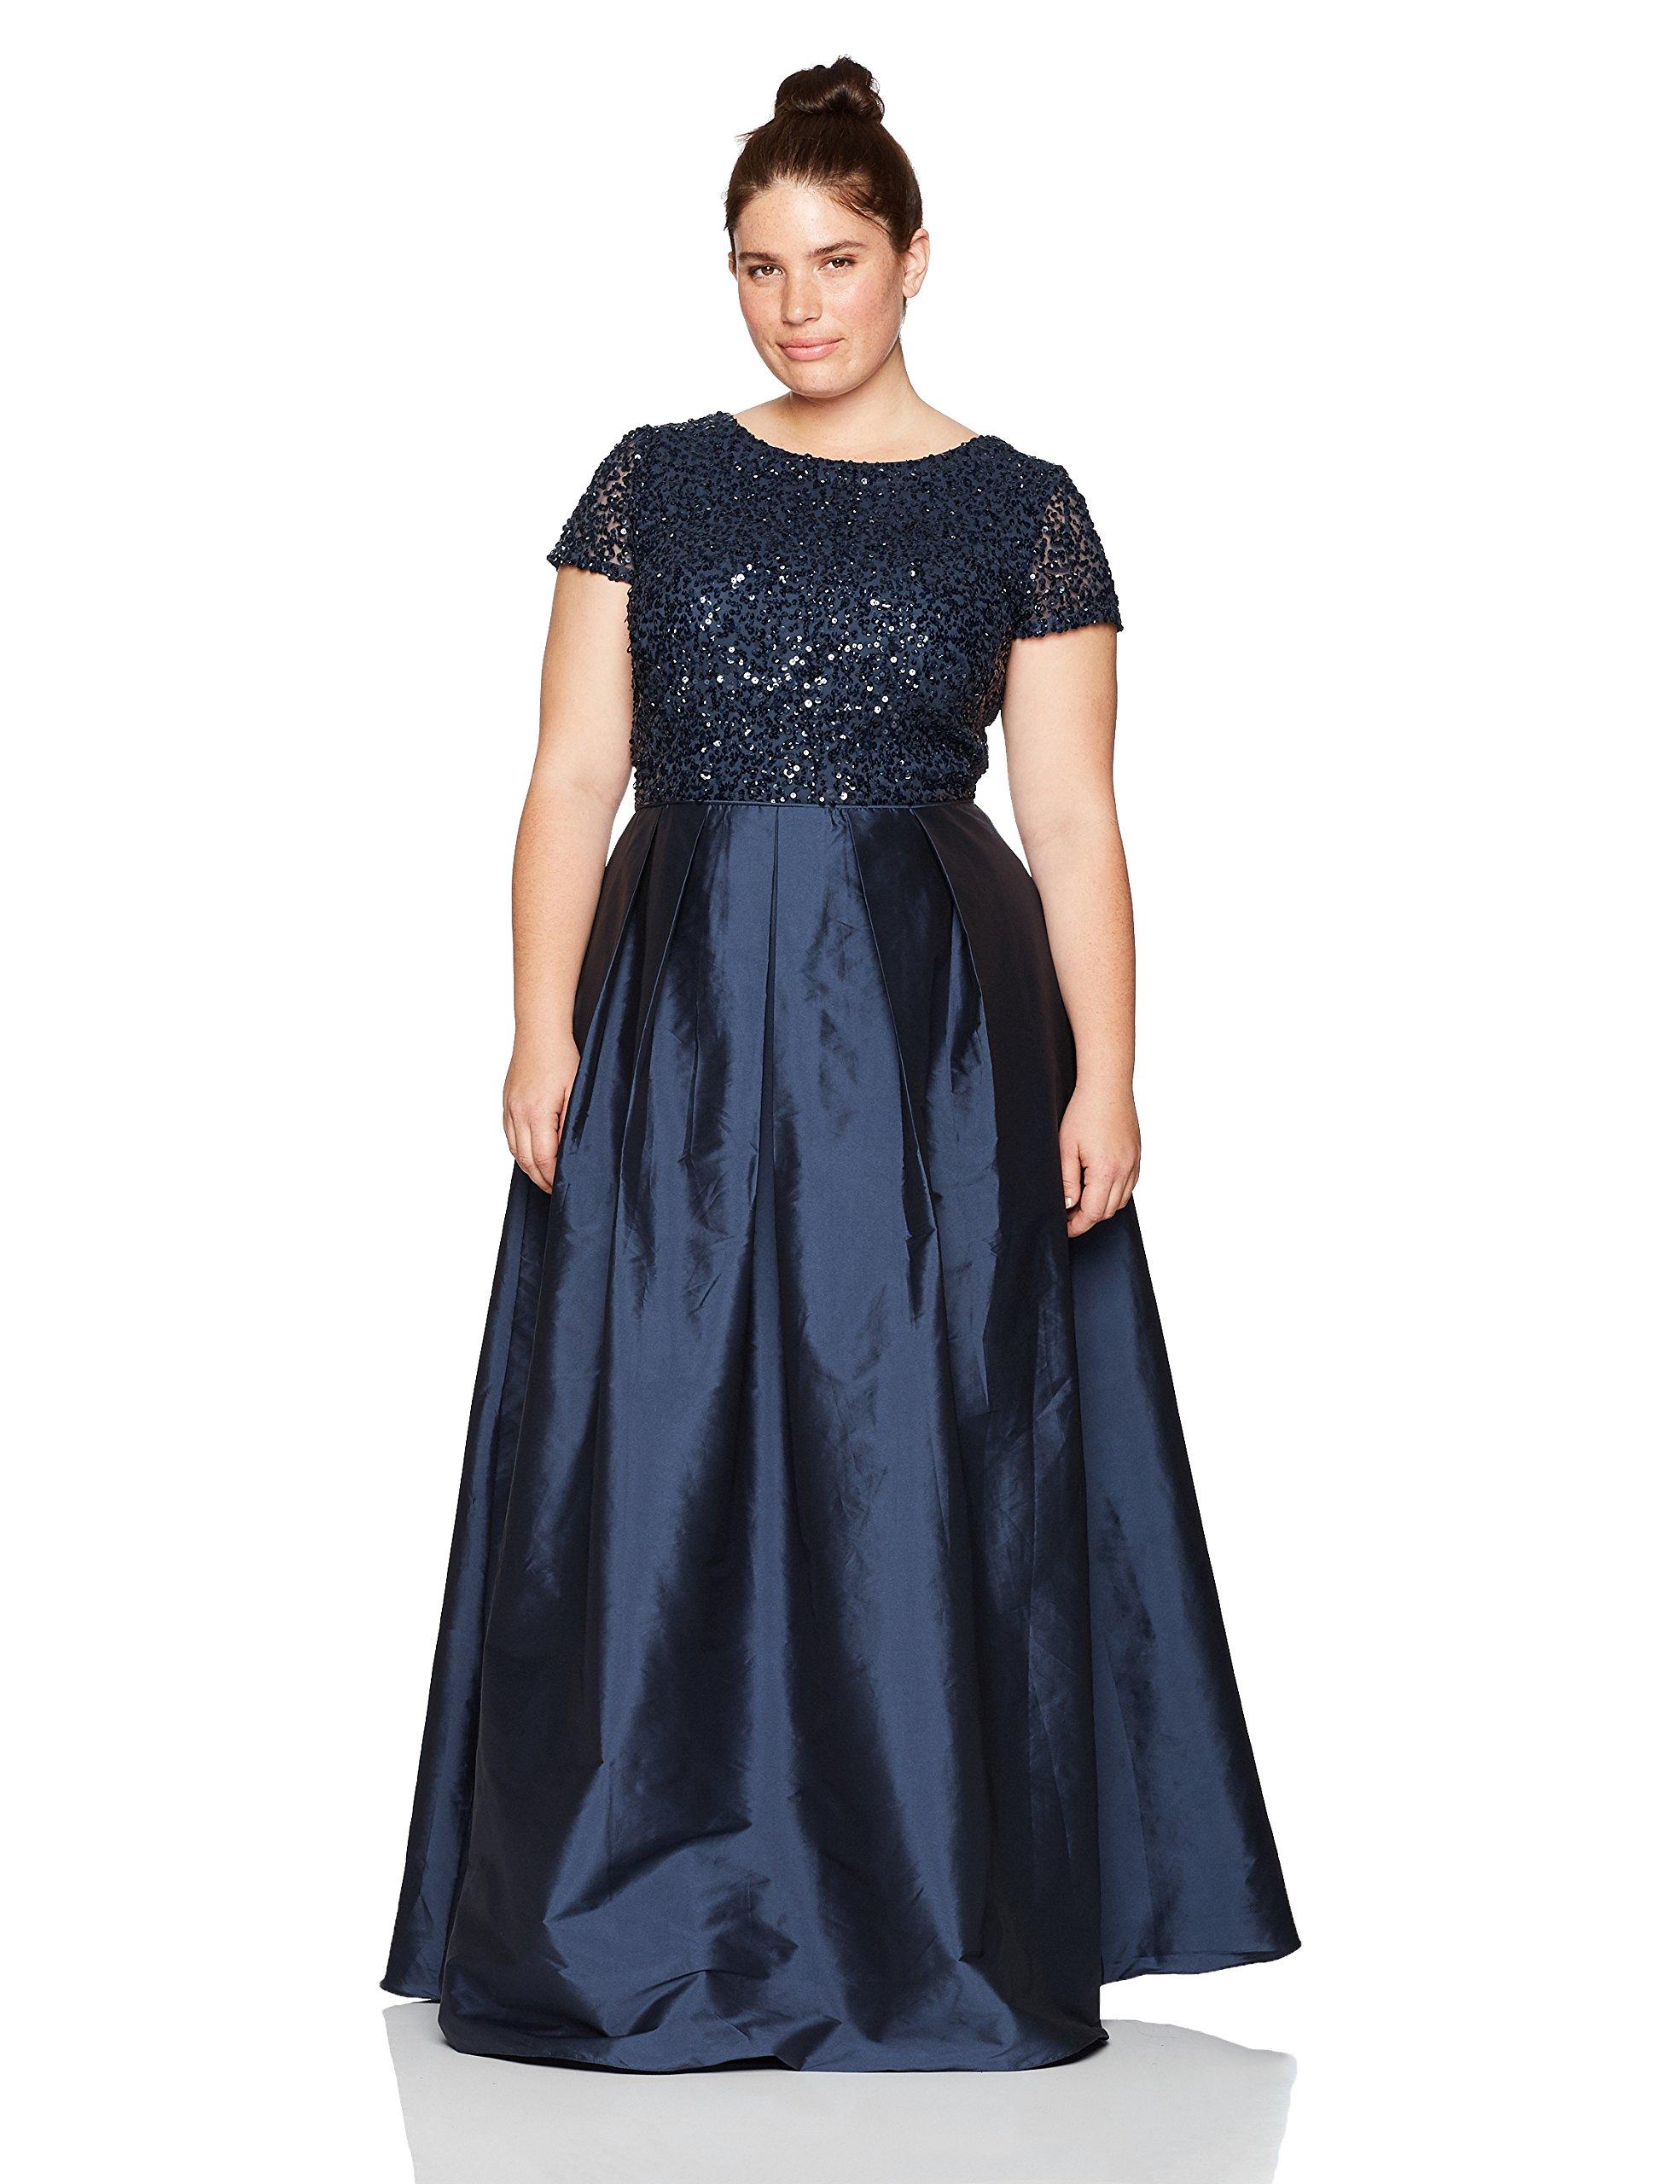 Adrianna Papell Women's Plus Size Taffeta Gown with Beaded Bodice, Navy, 16W